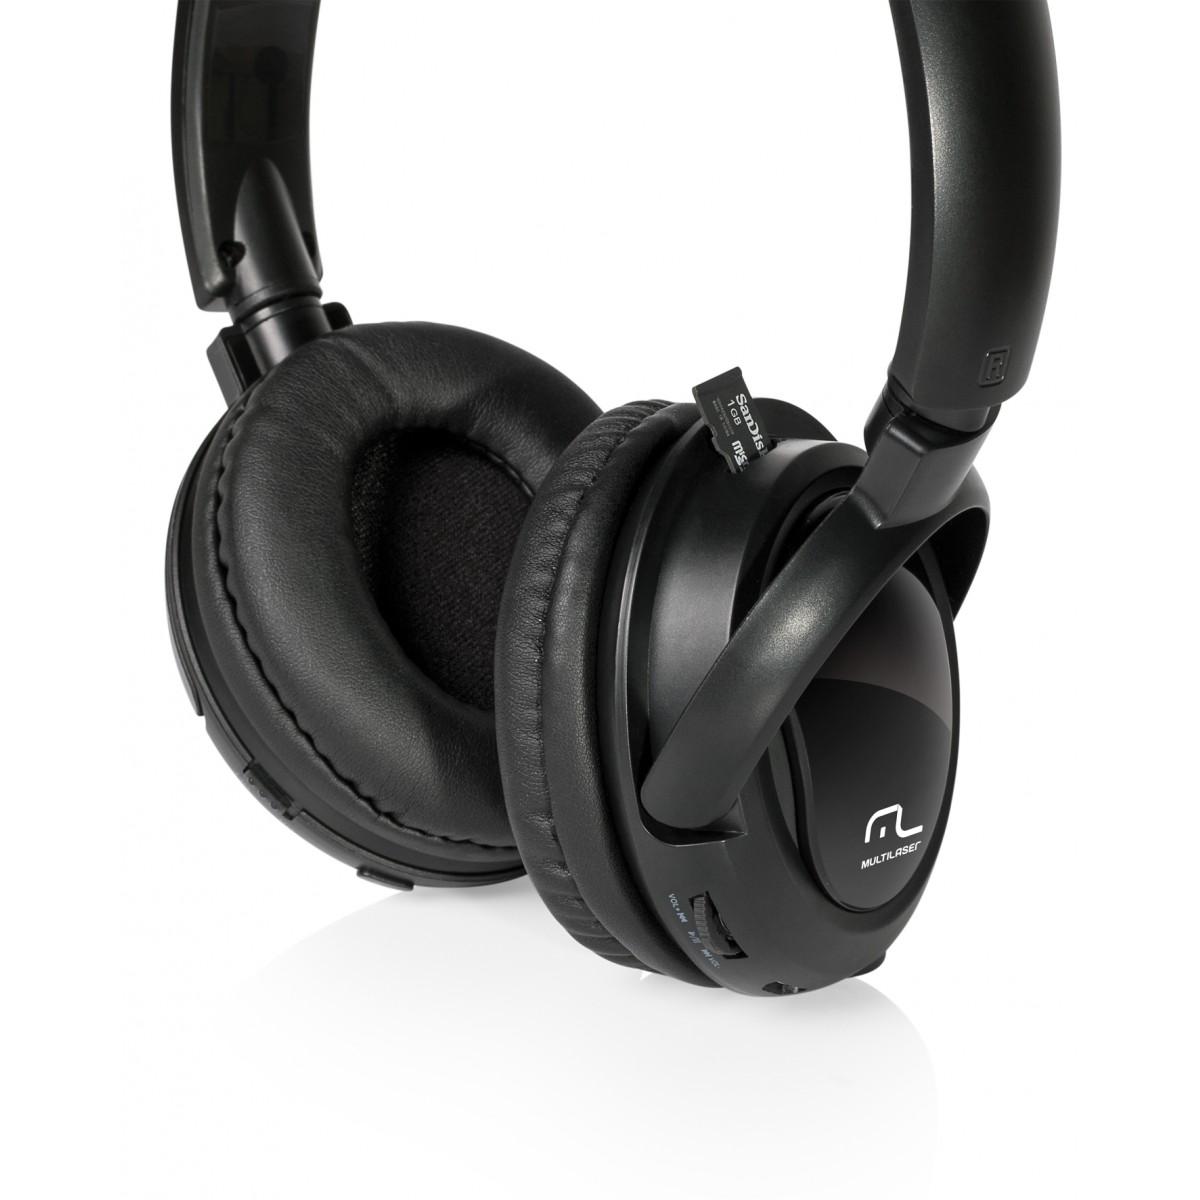 Fone de Ouvido Bluetooth MP3 PM PH095 - Multilaser